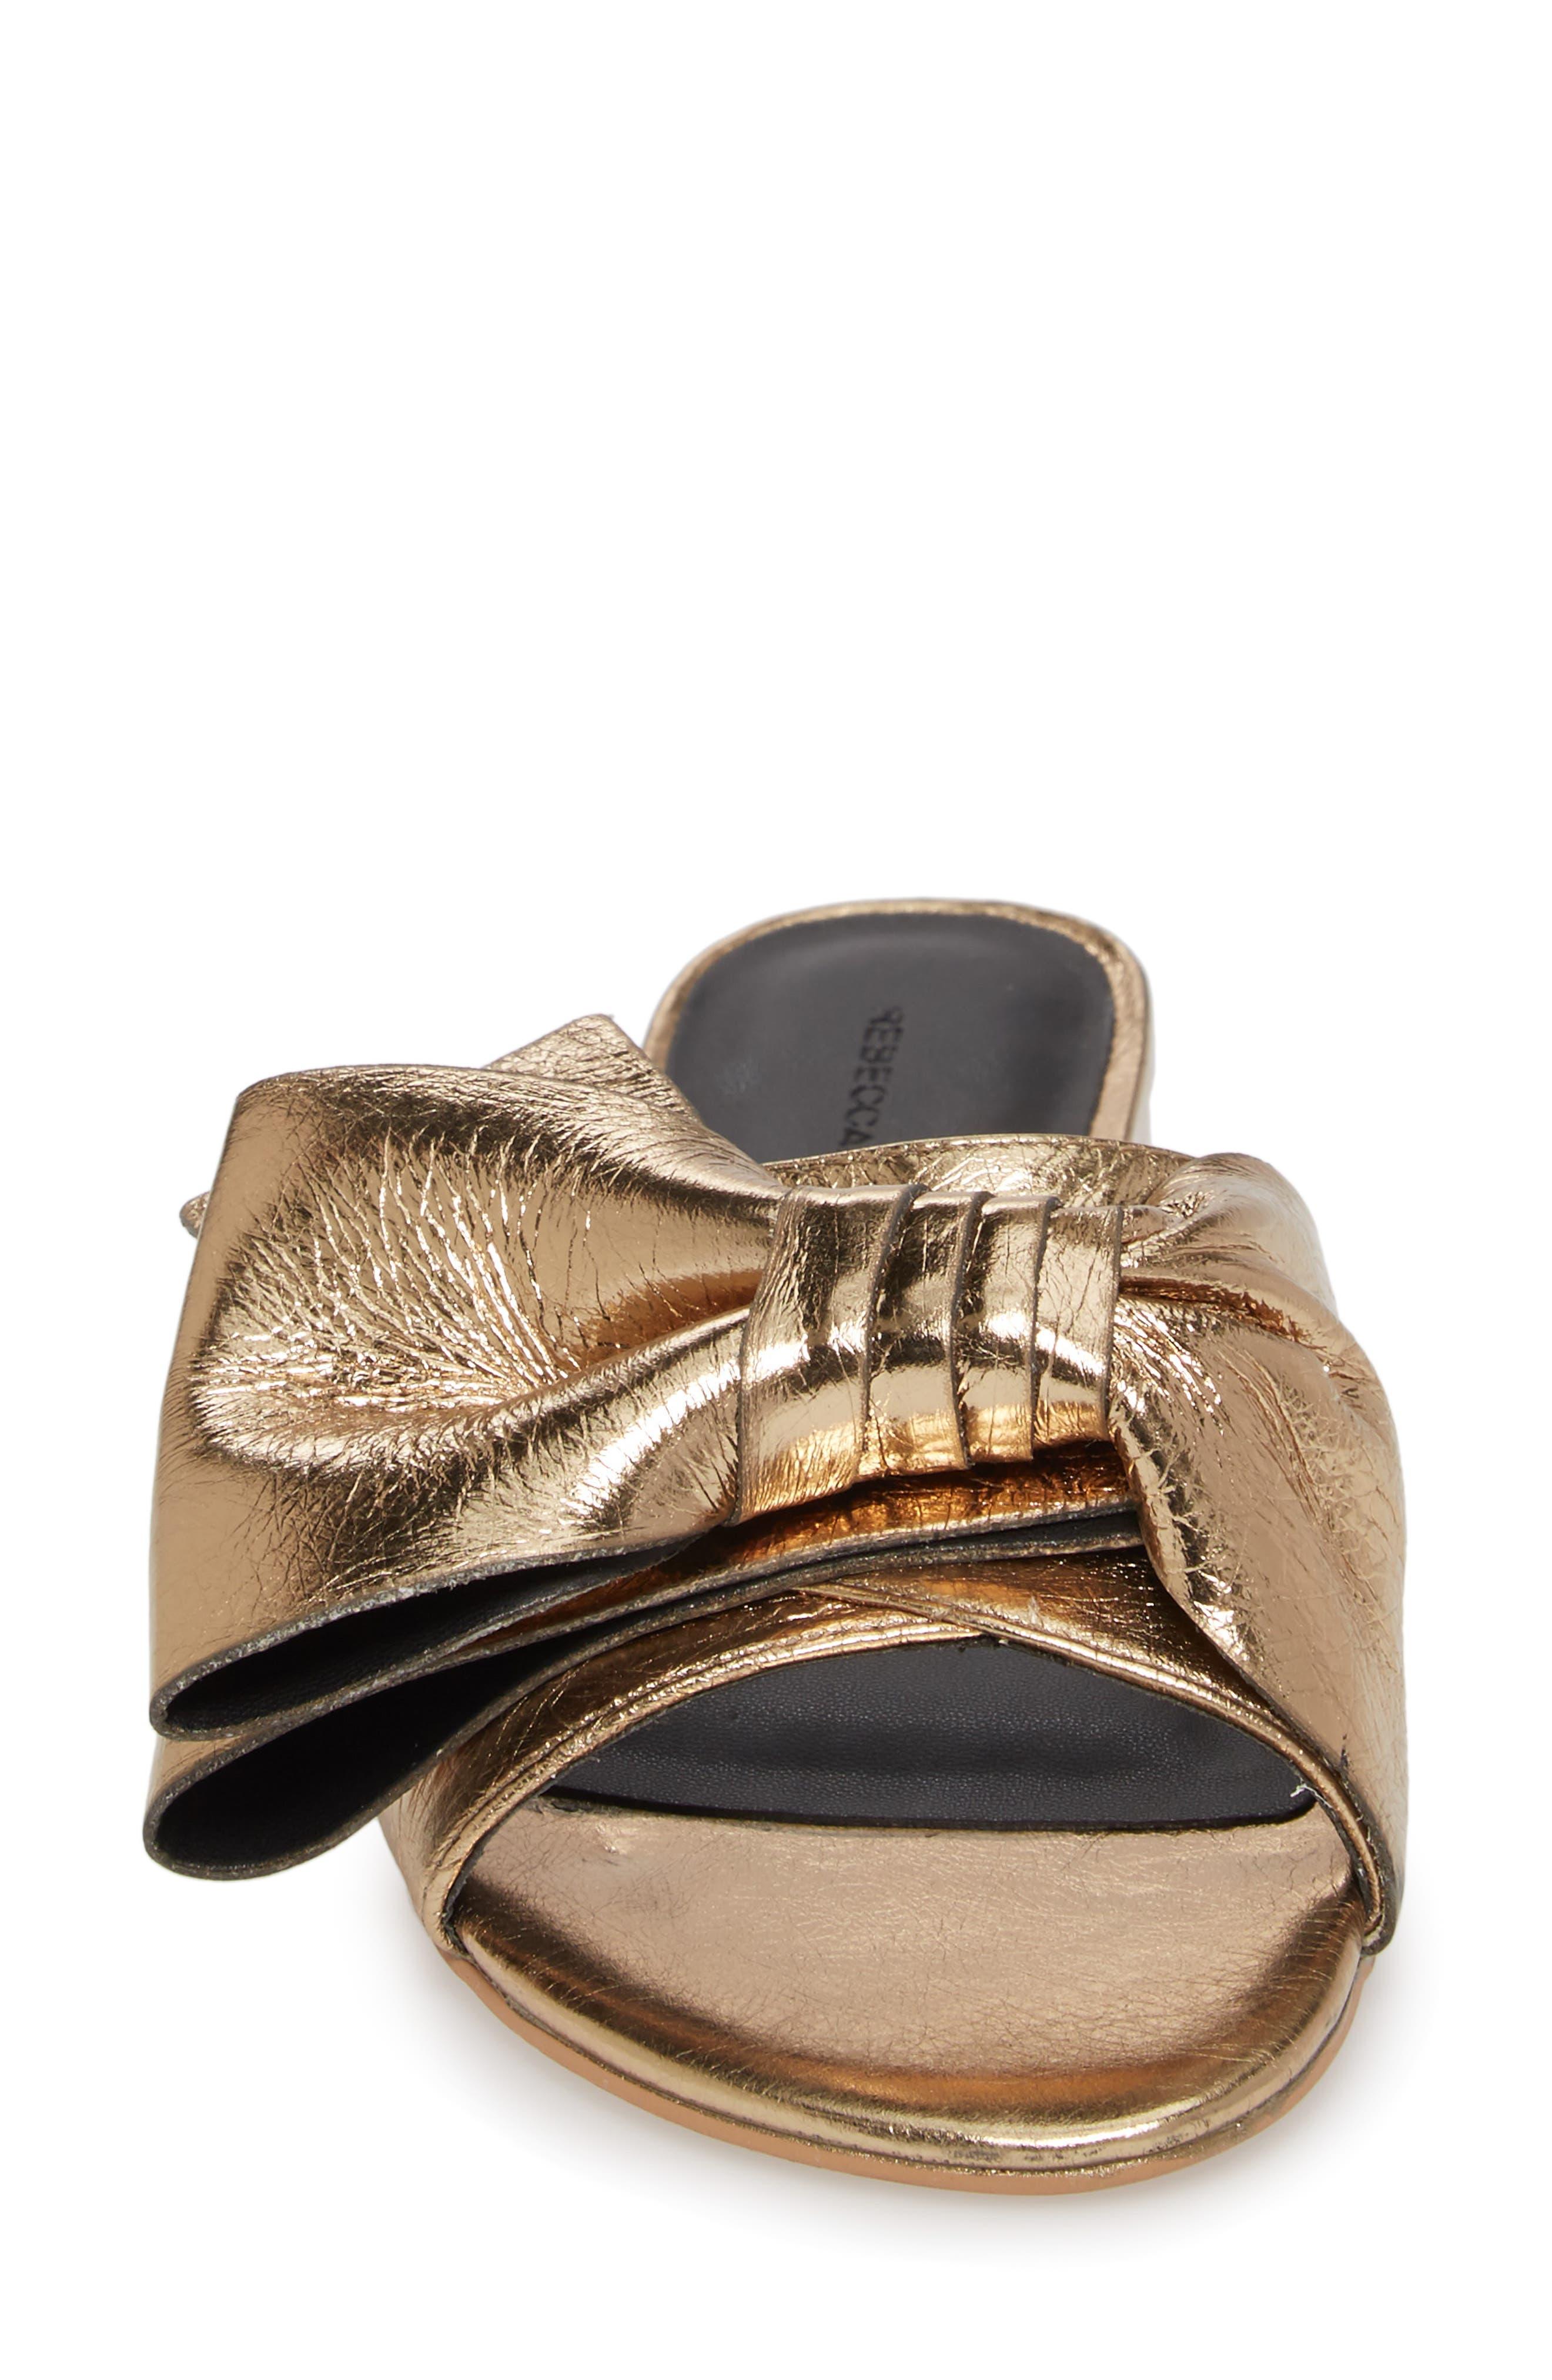 Calista Sandal,                             Alternate thumbnail 4, color,                             Gold Metallic Leather